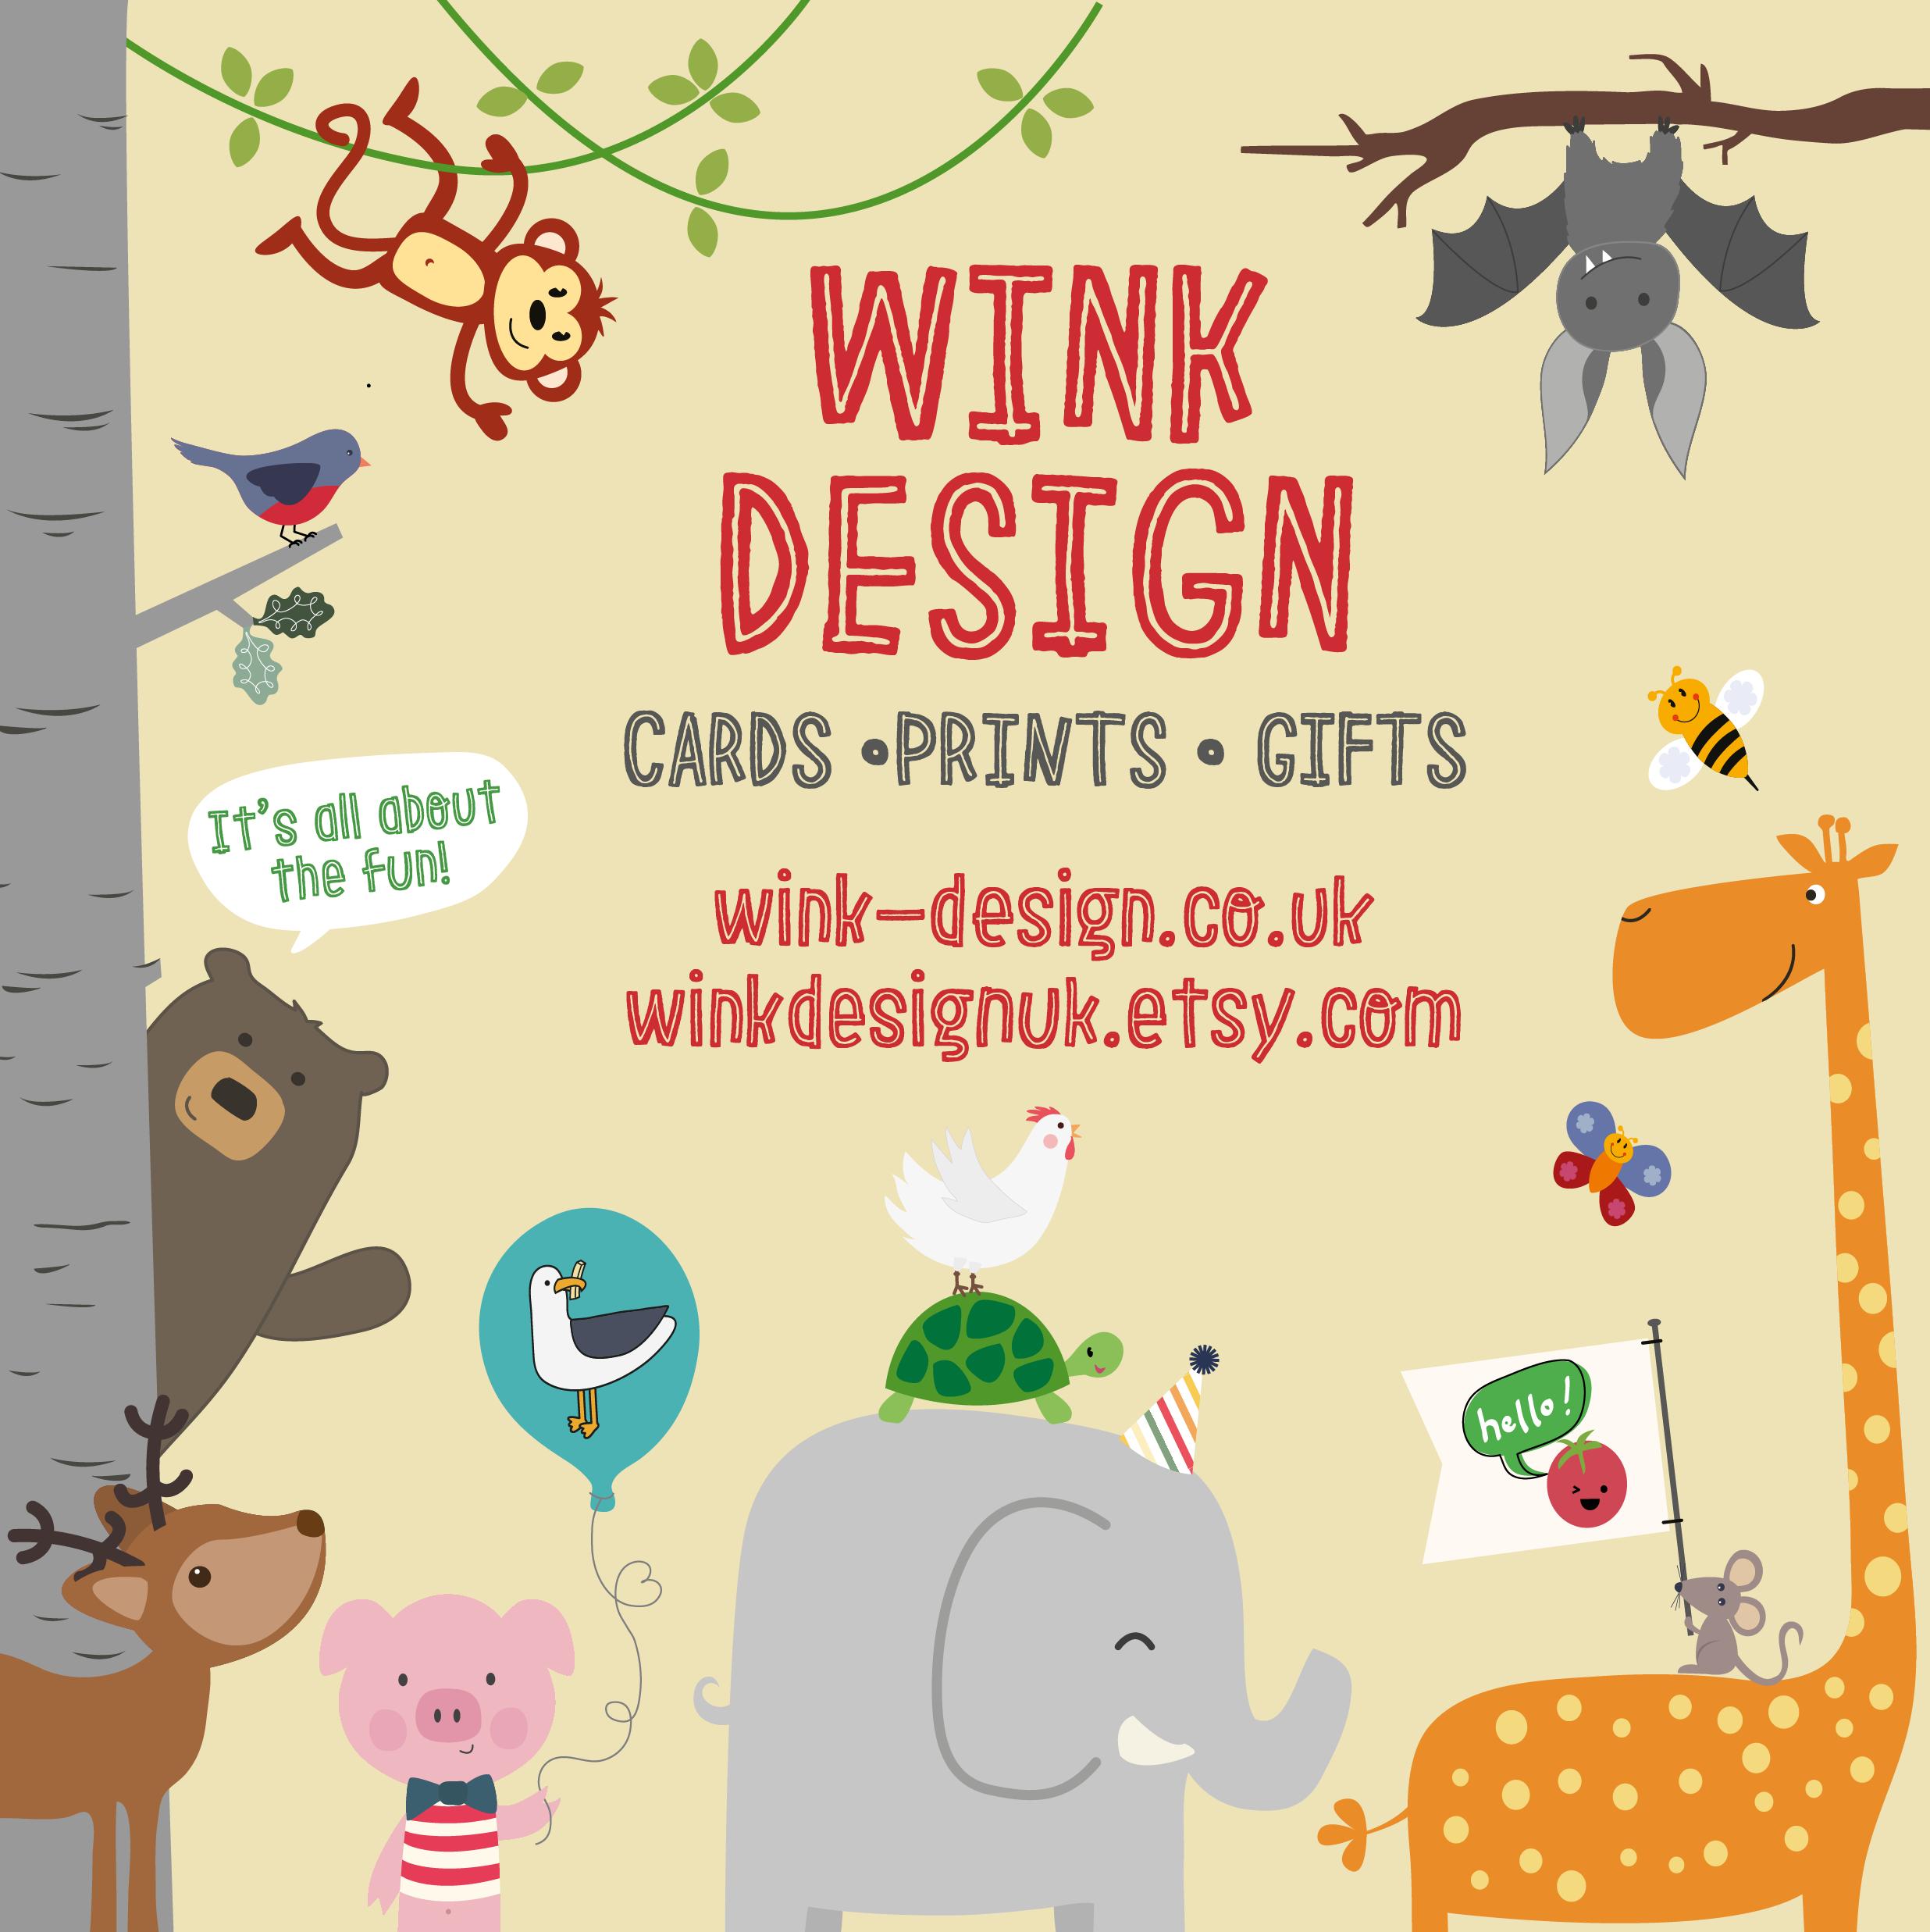 WINK-DESIGN-SQUARE - Michelle Lancaster